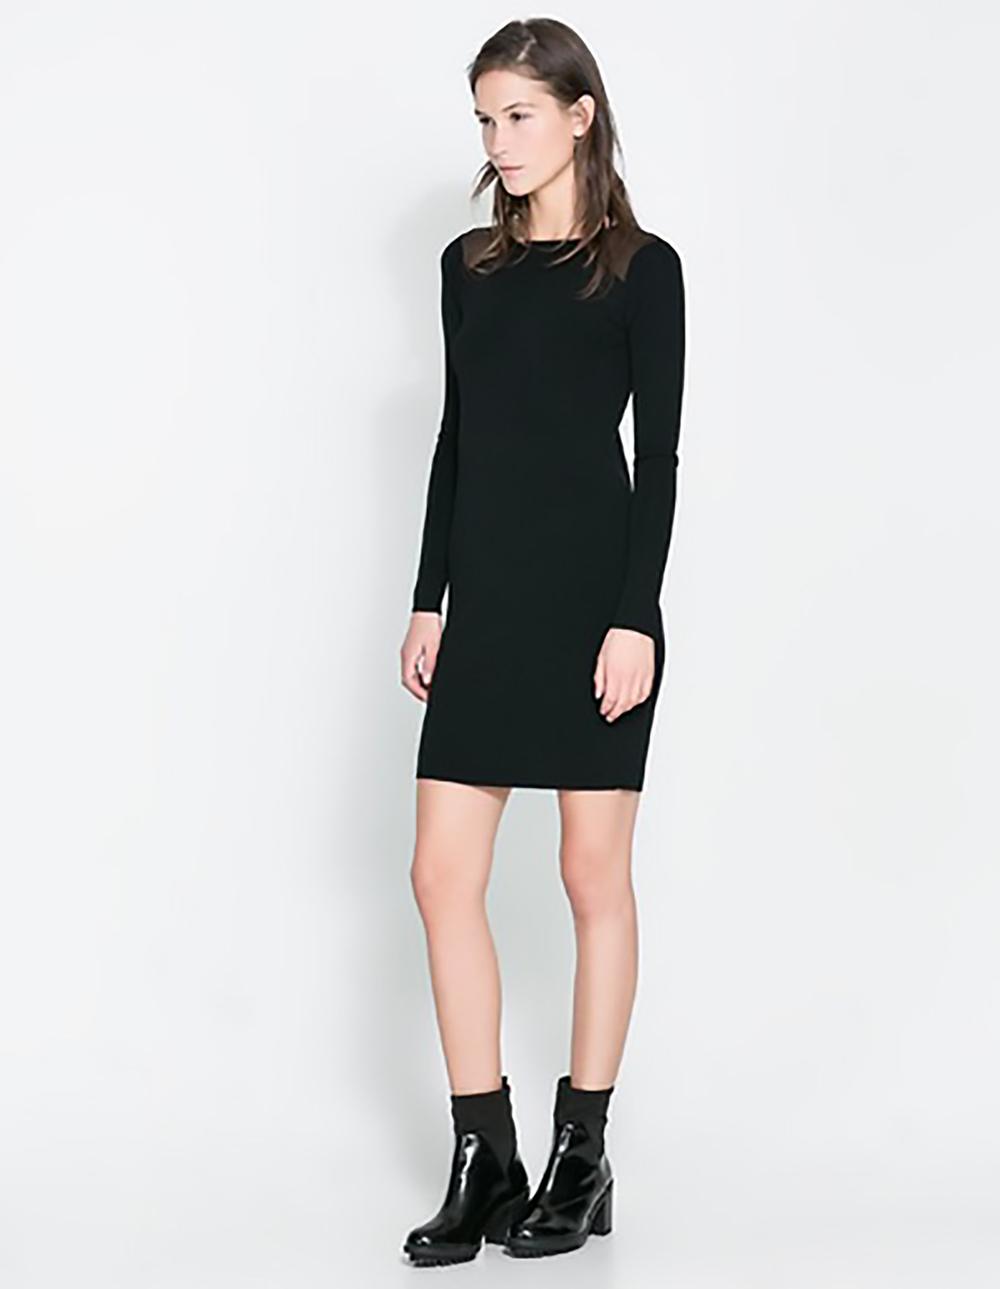 zara dress with sheer shoulders short dresses 1500.jpg